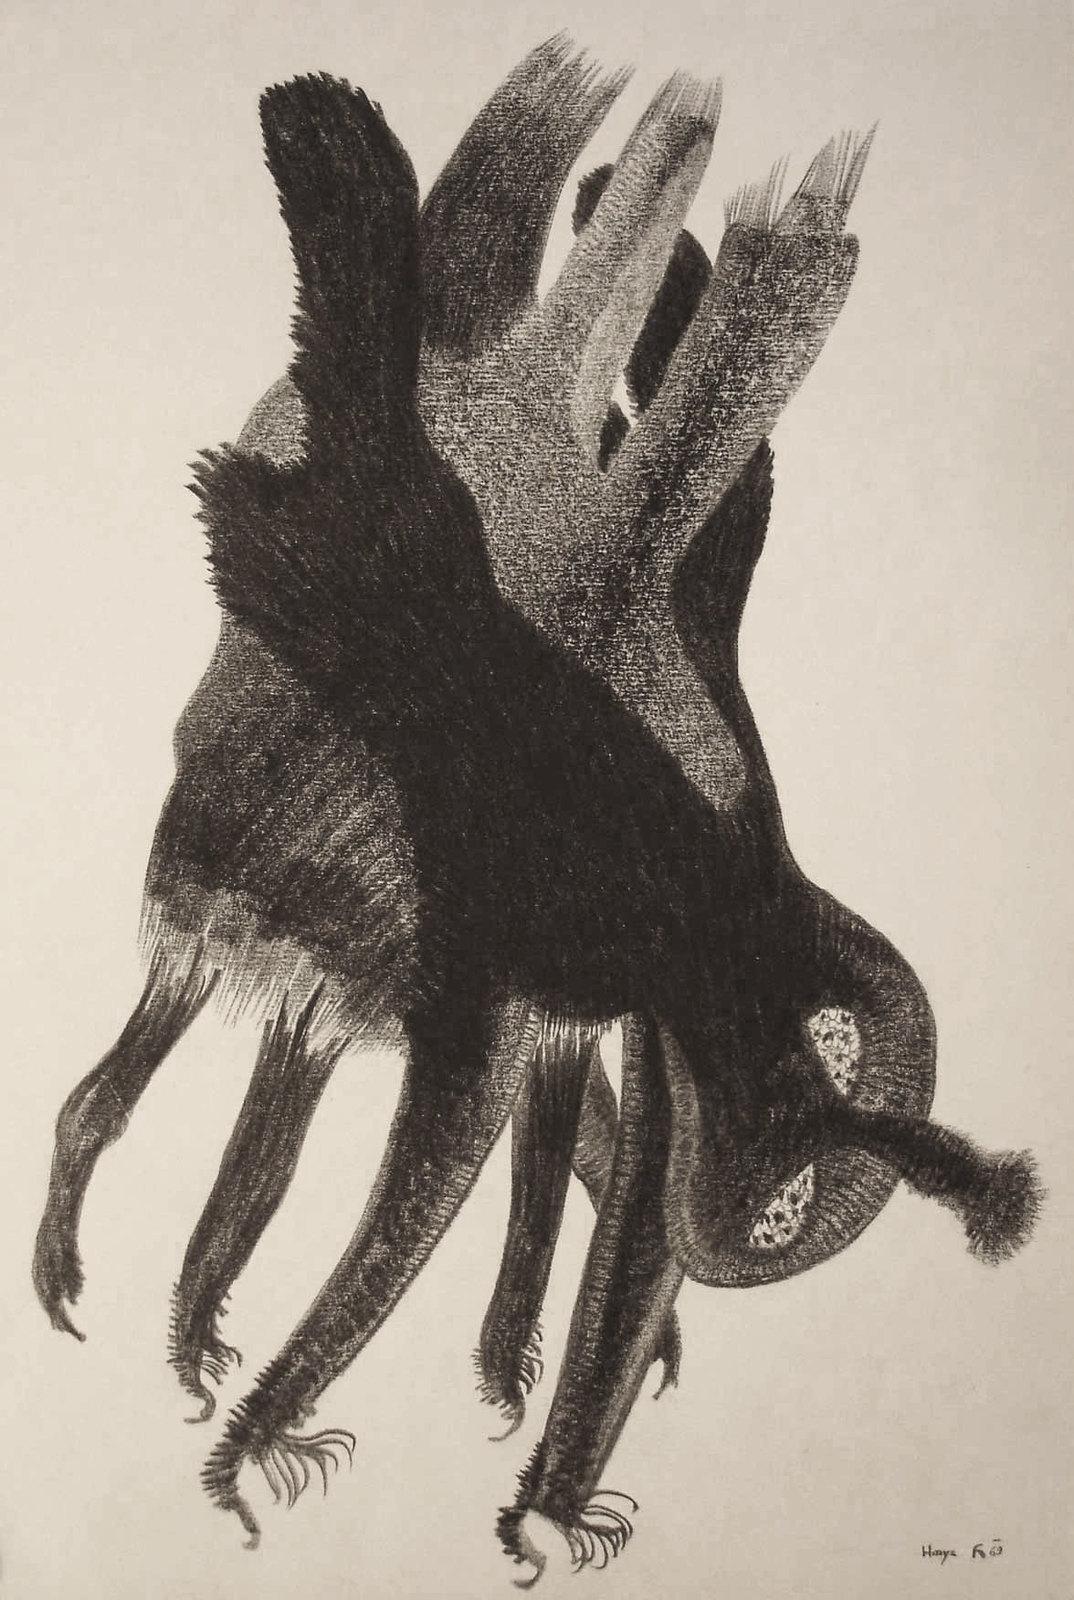 Karel Havlícek - Hmyz, 1968